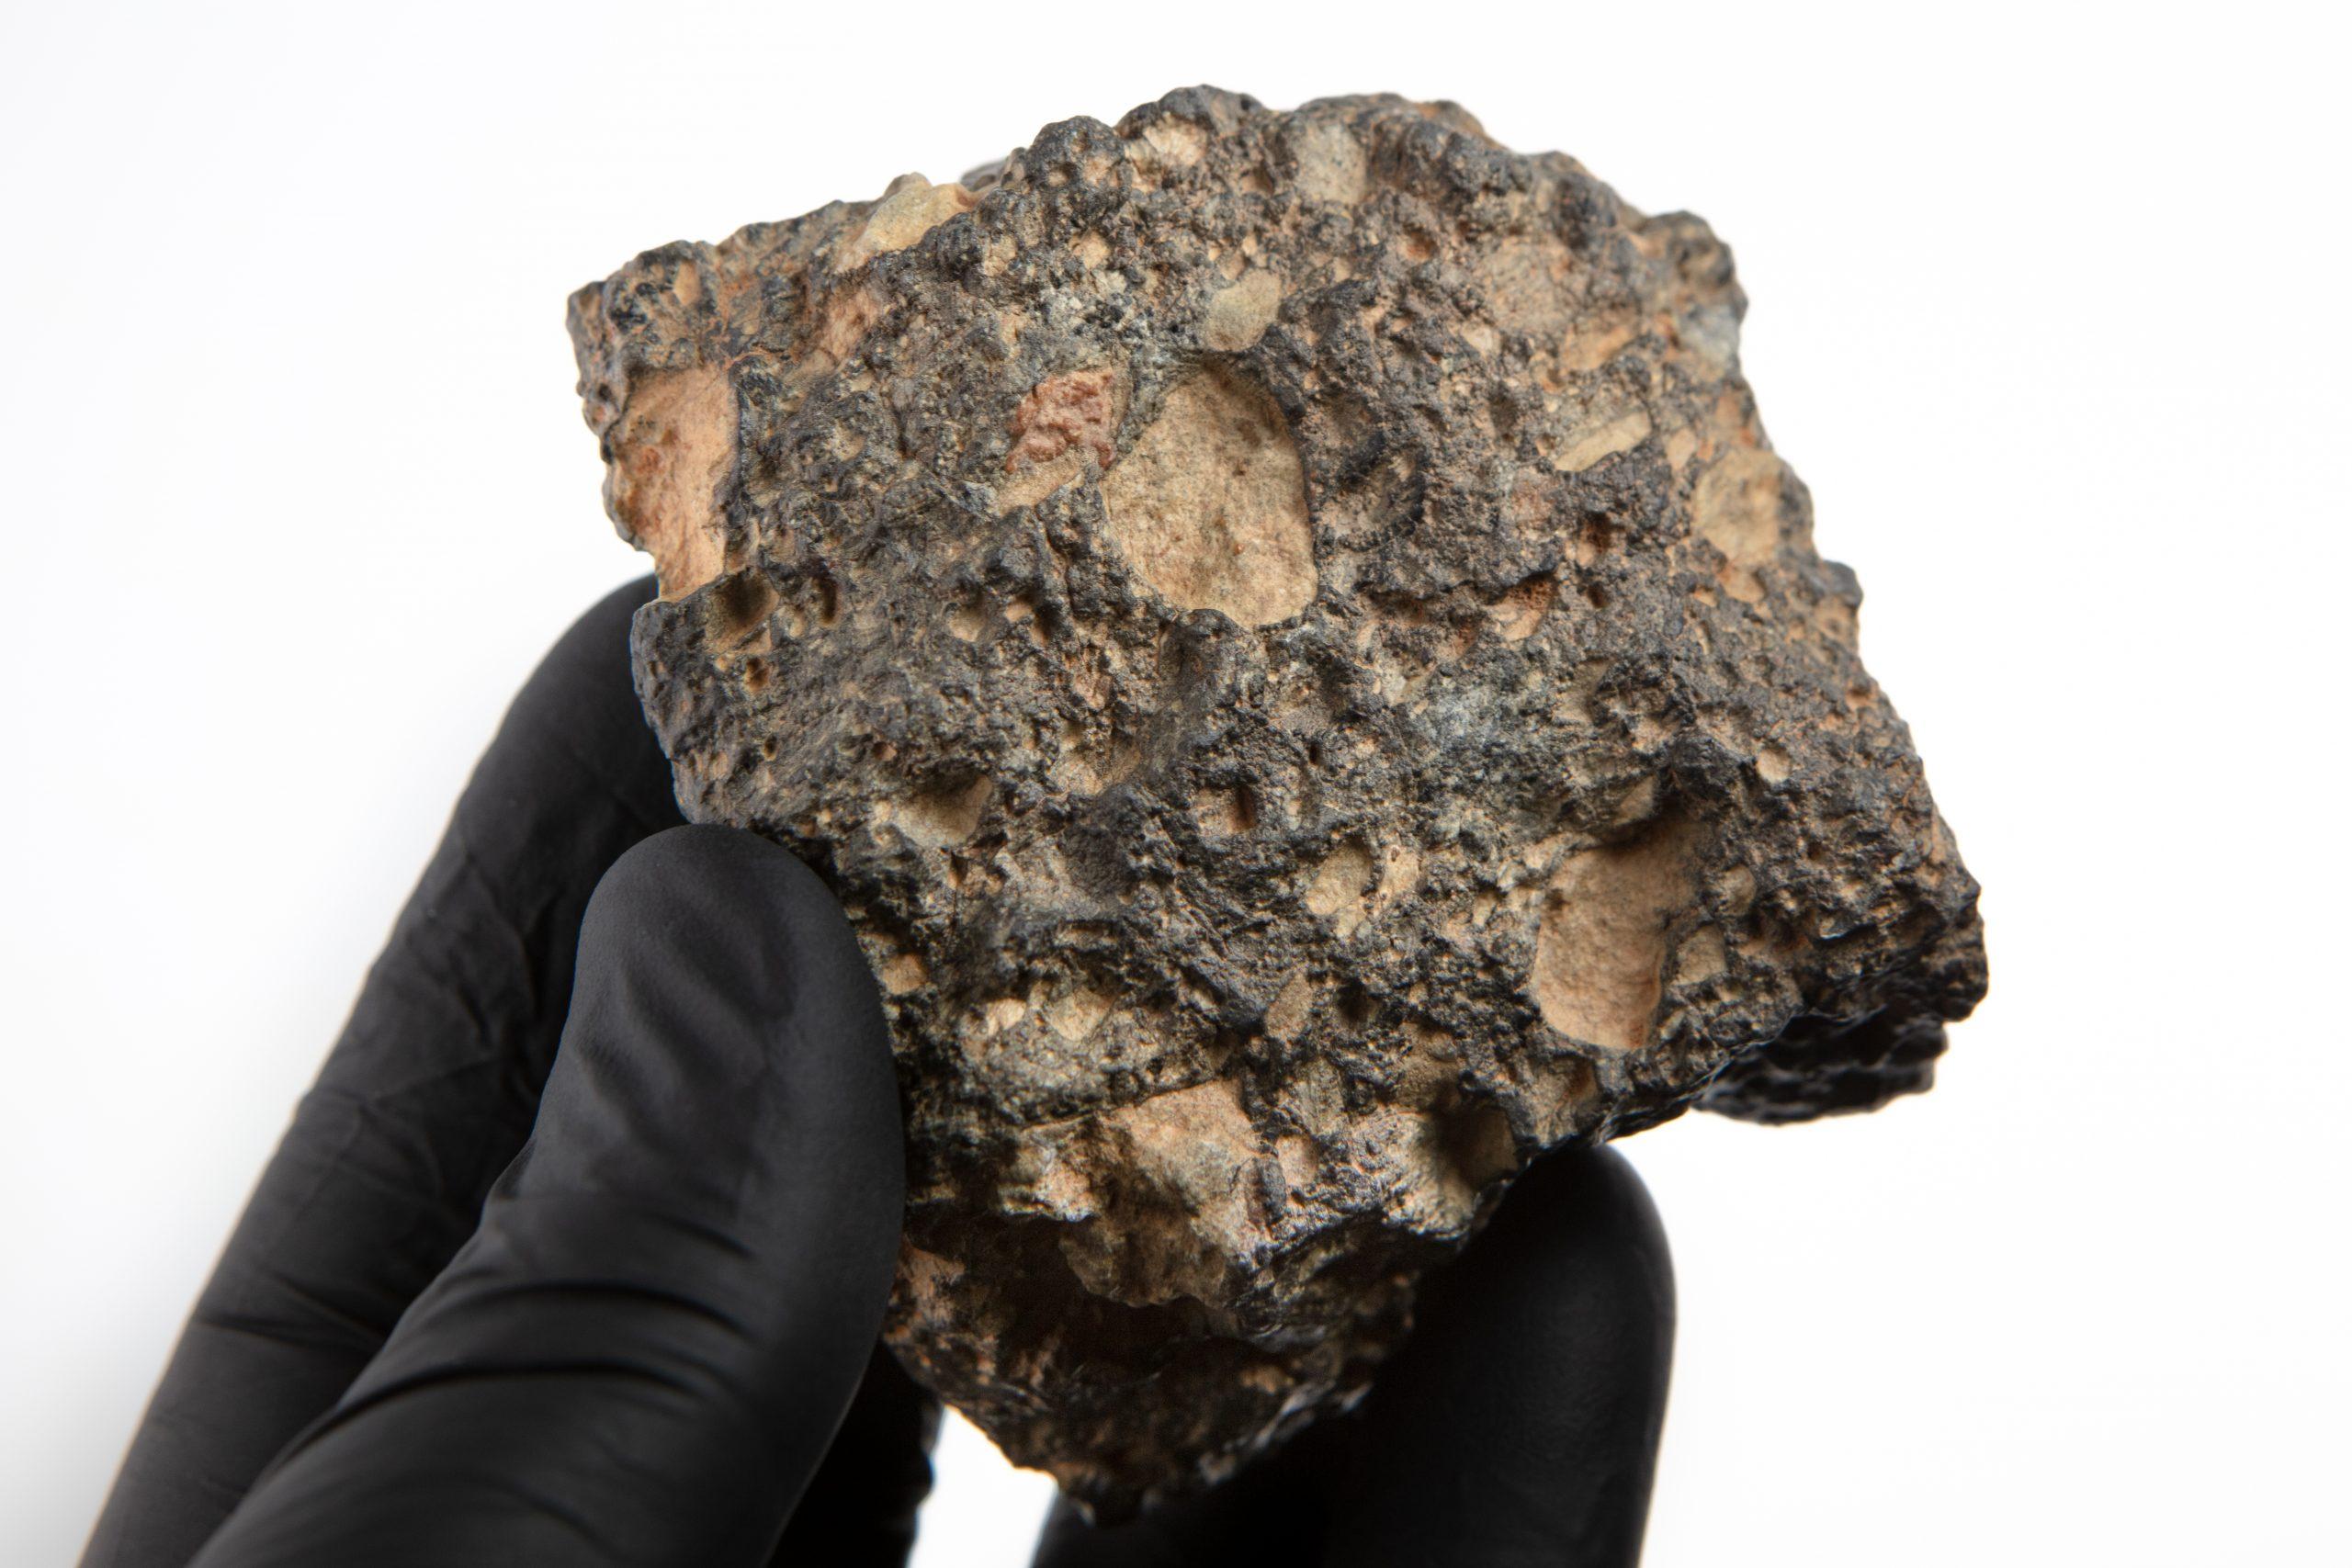 lunar meteorite whole stone